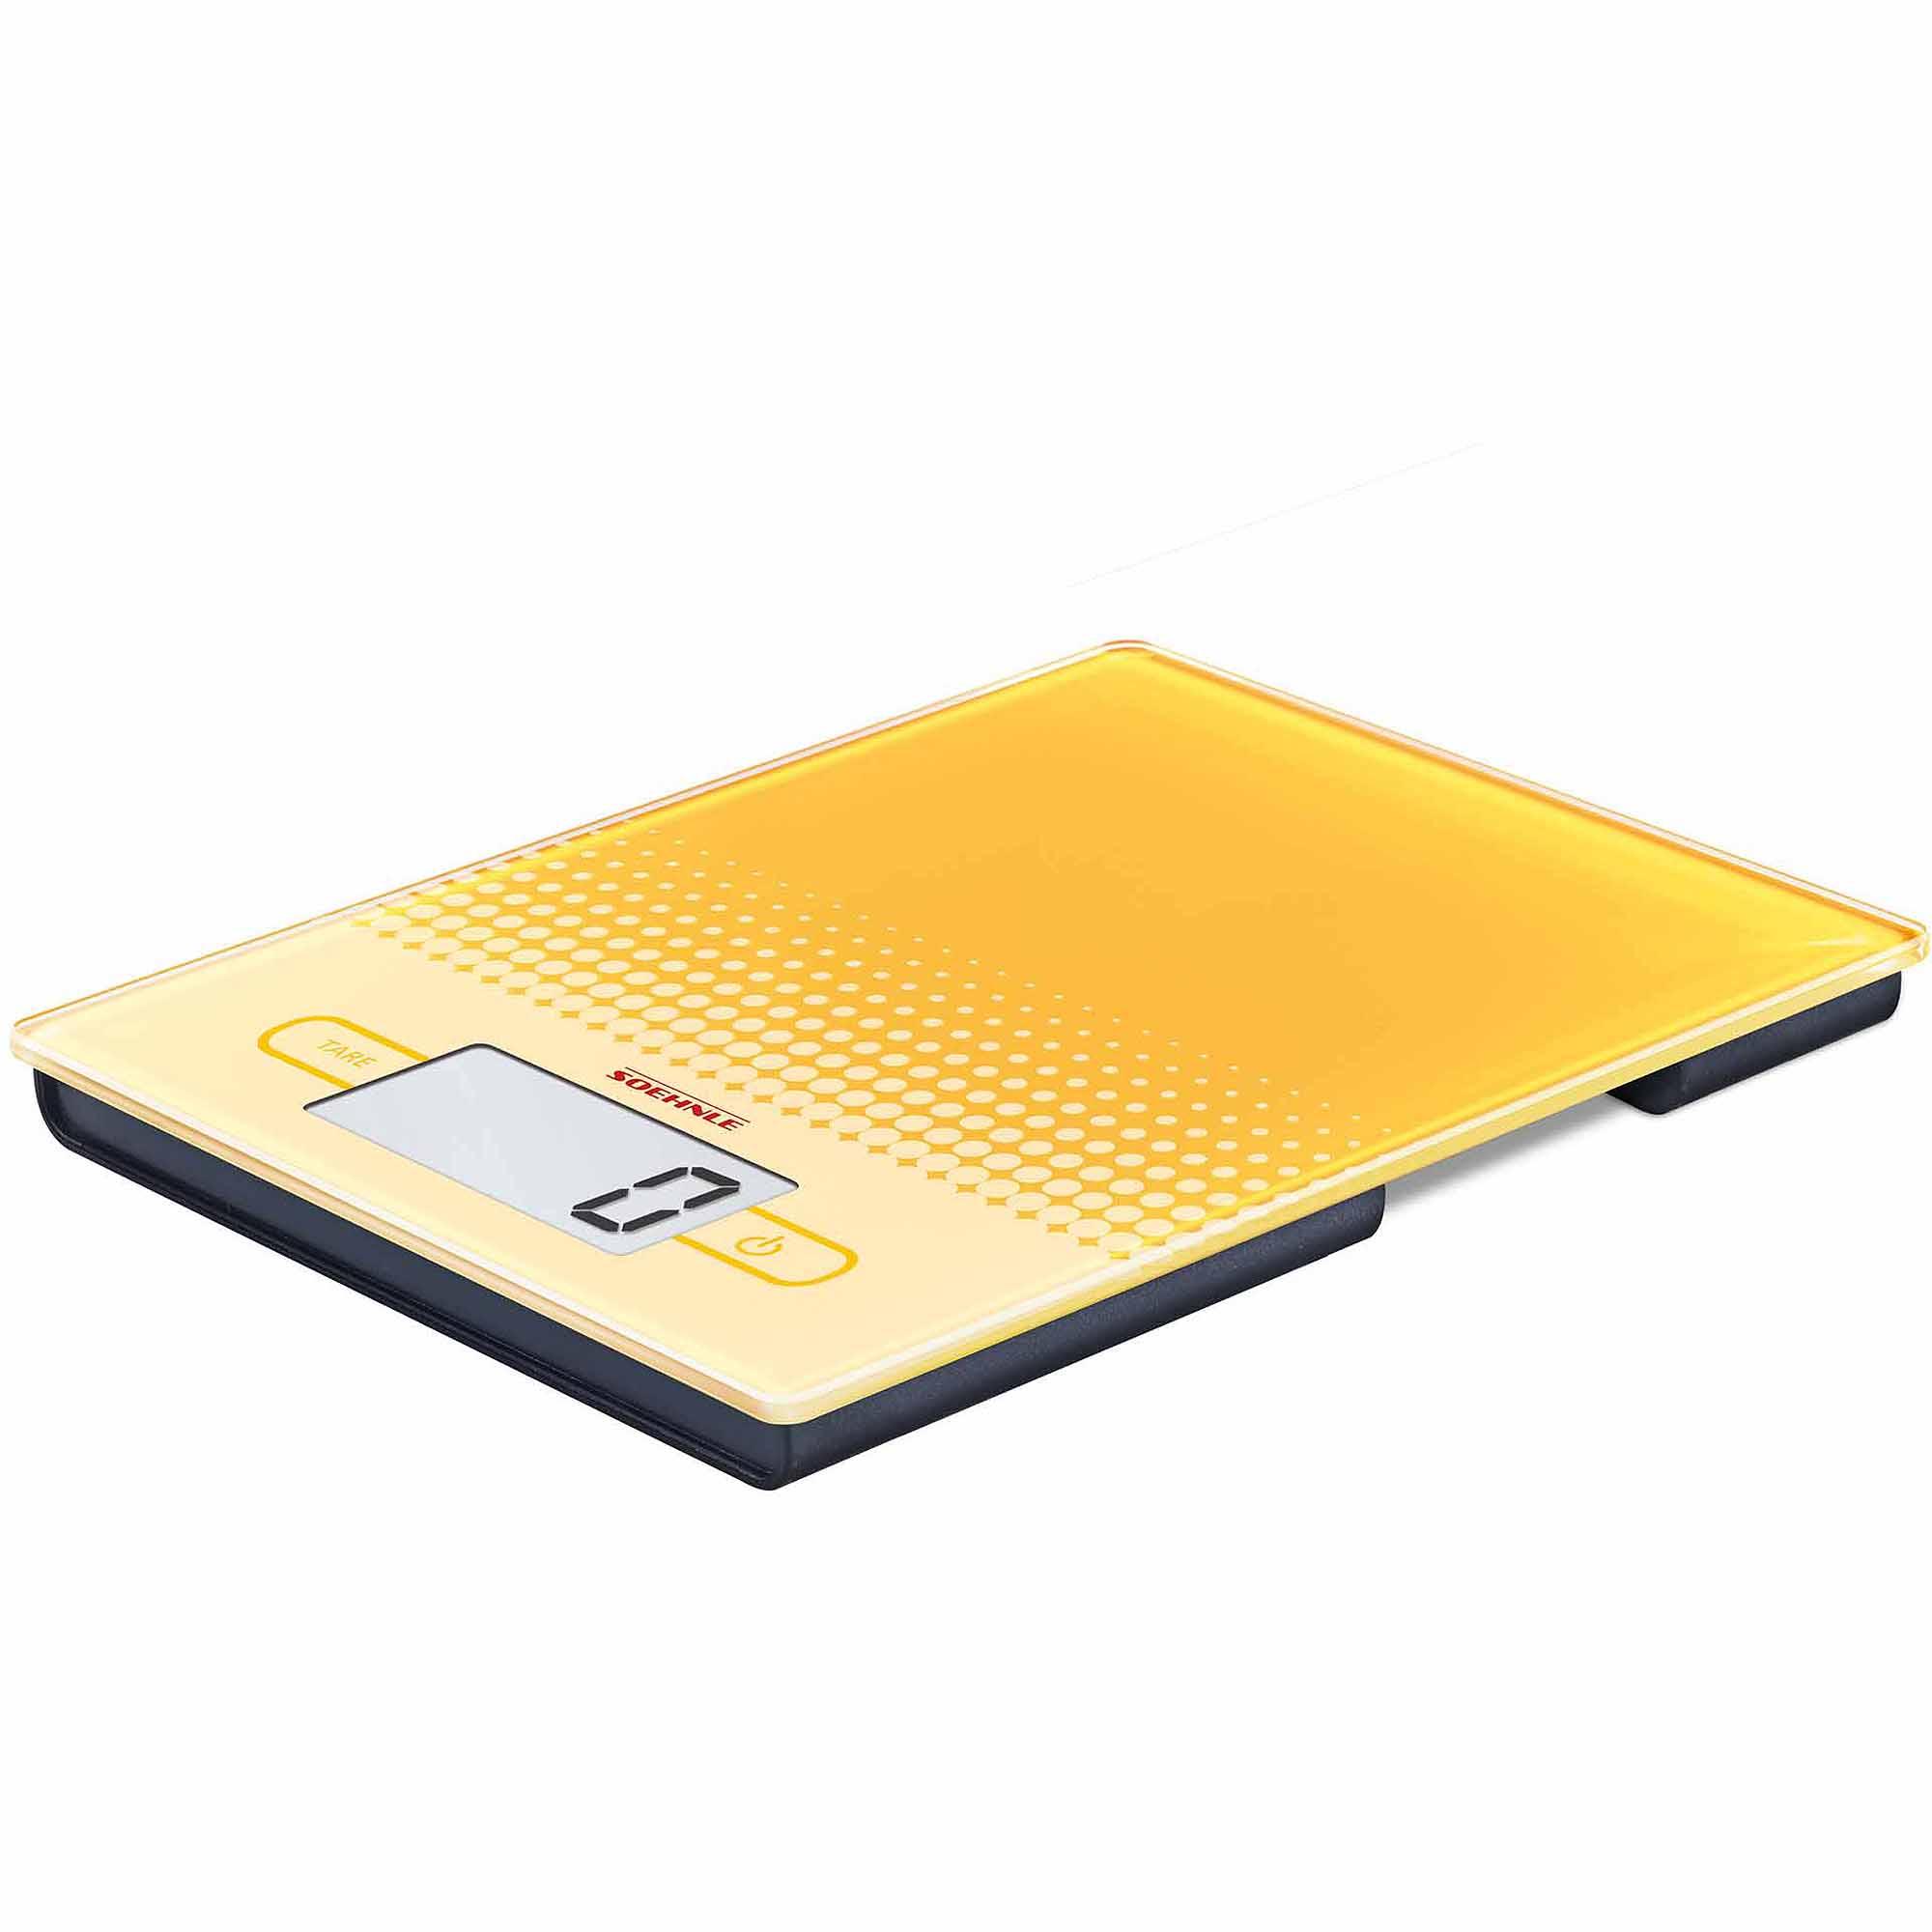 Soehnle CITY Precision Digital Food Scale, 11 lb Capacity, Yellow